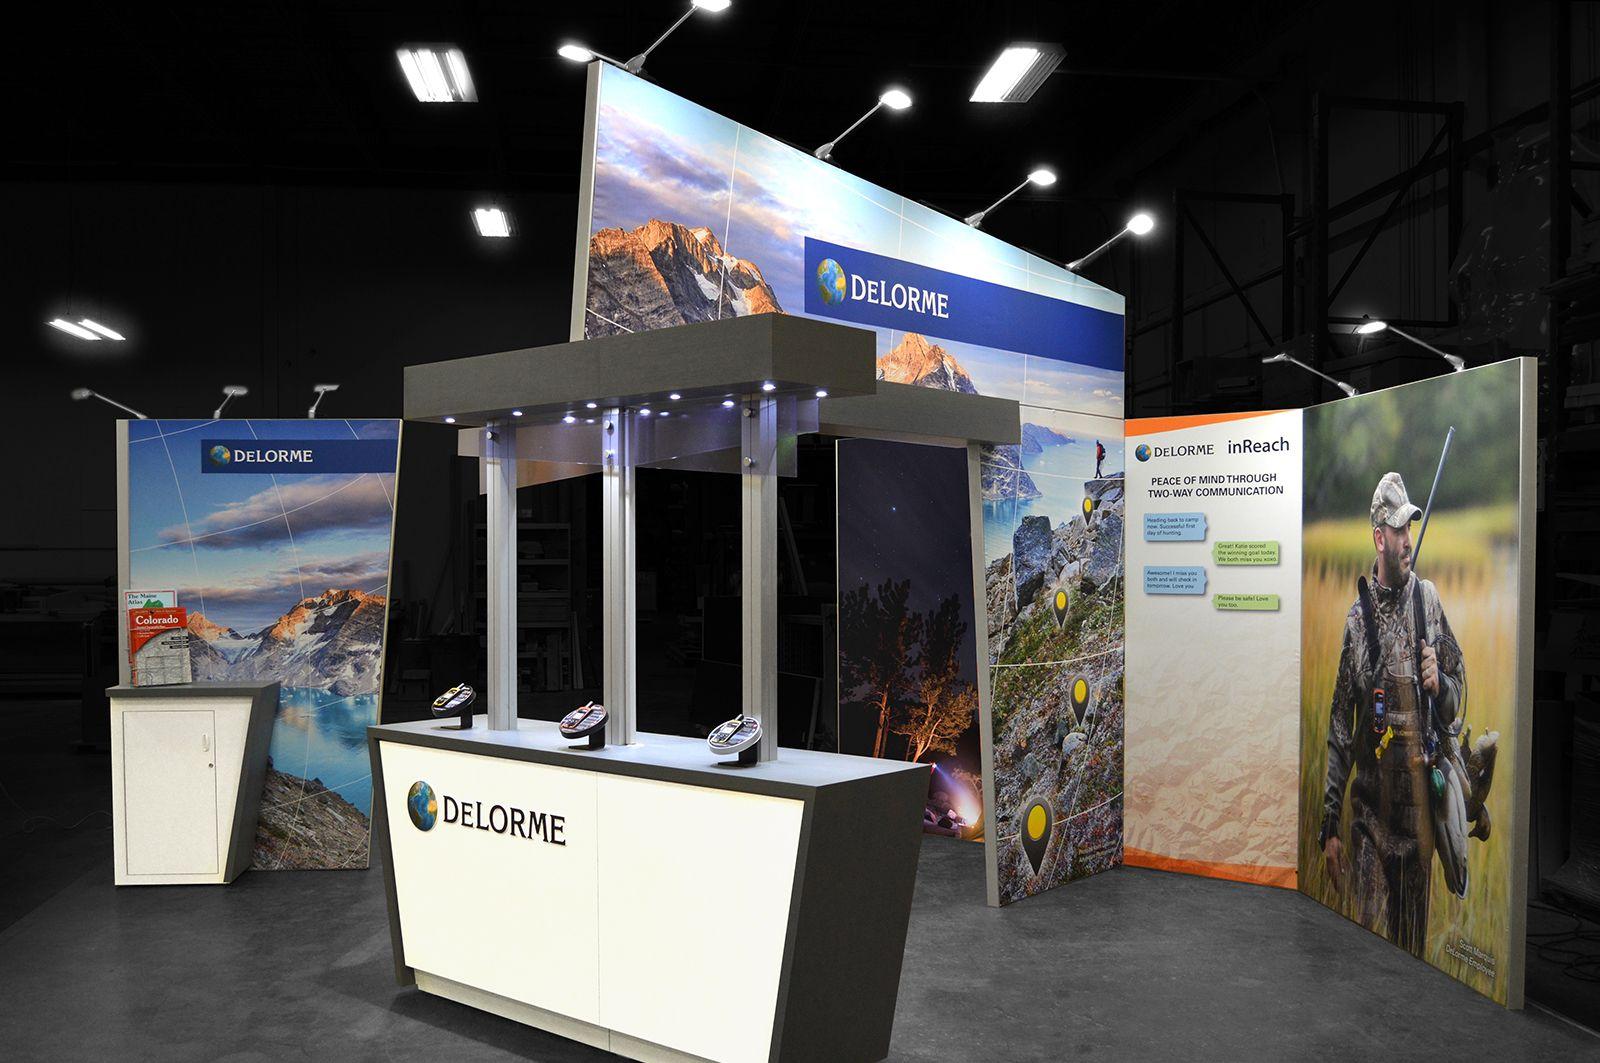 Peninsula Exhibit Navigation Technology Exhibition Trade Show Exhibit Design